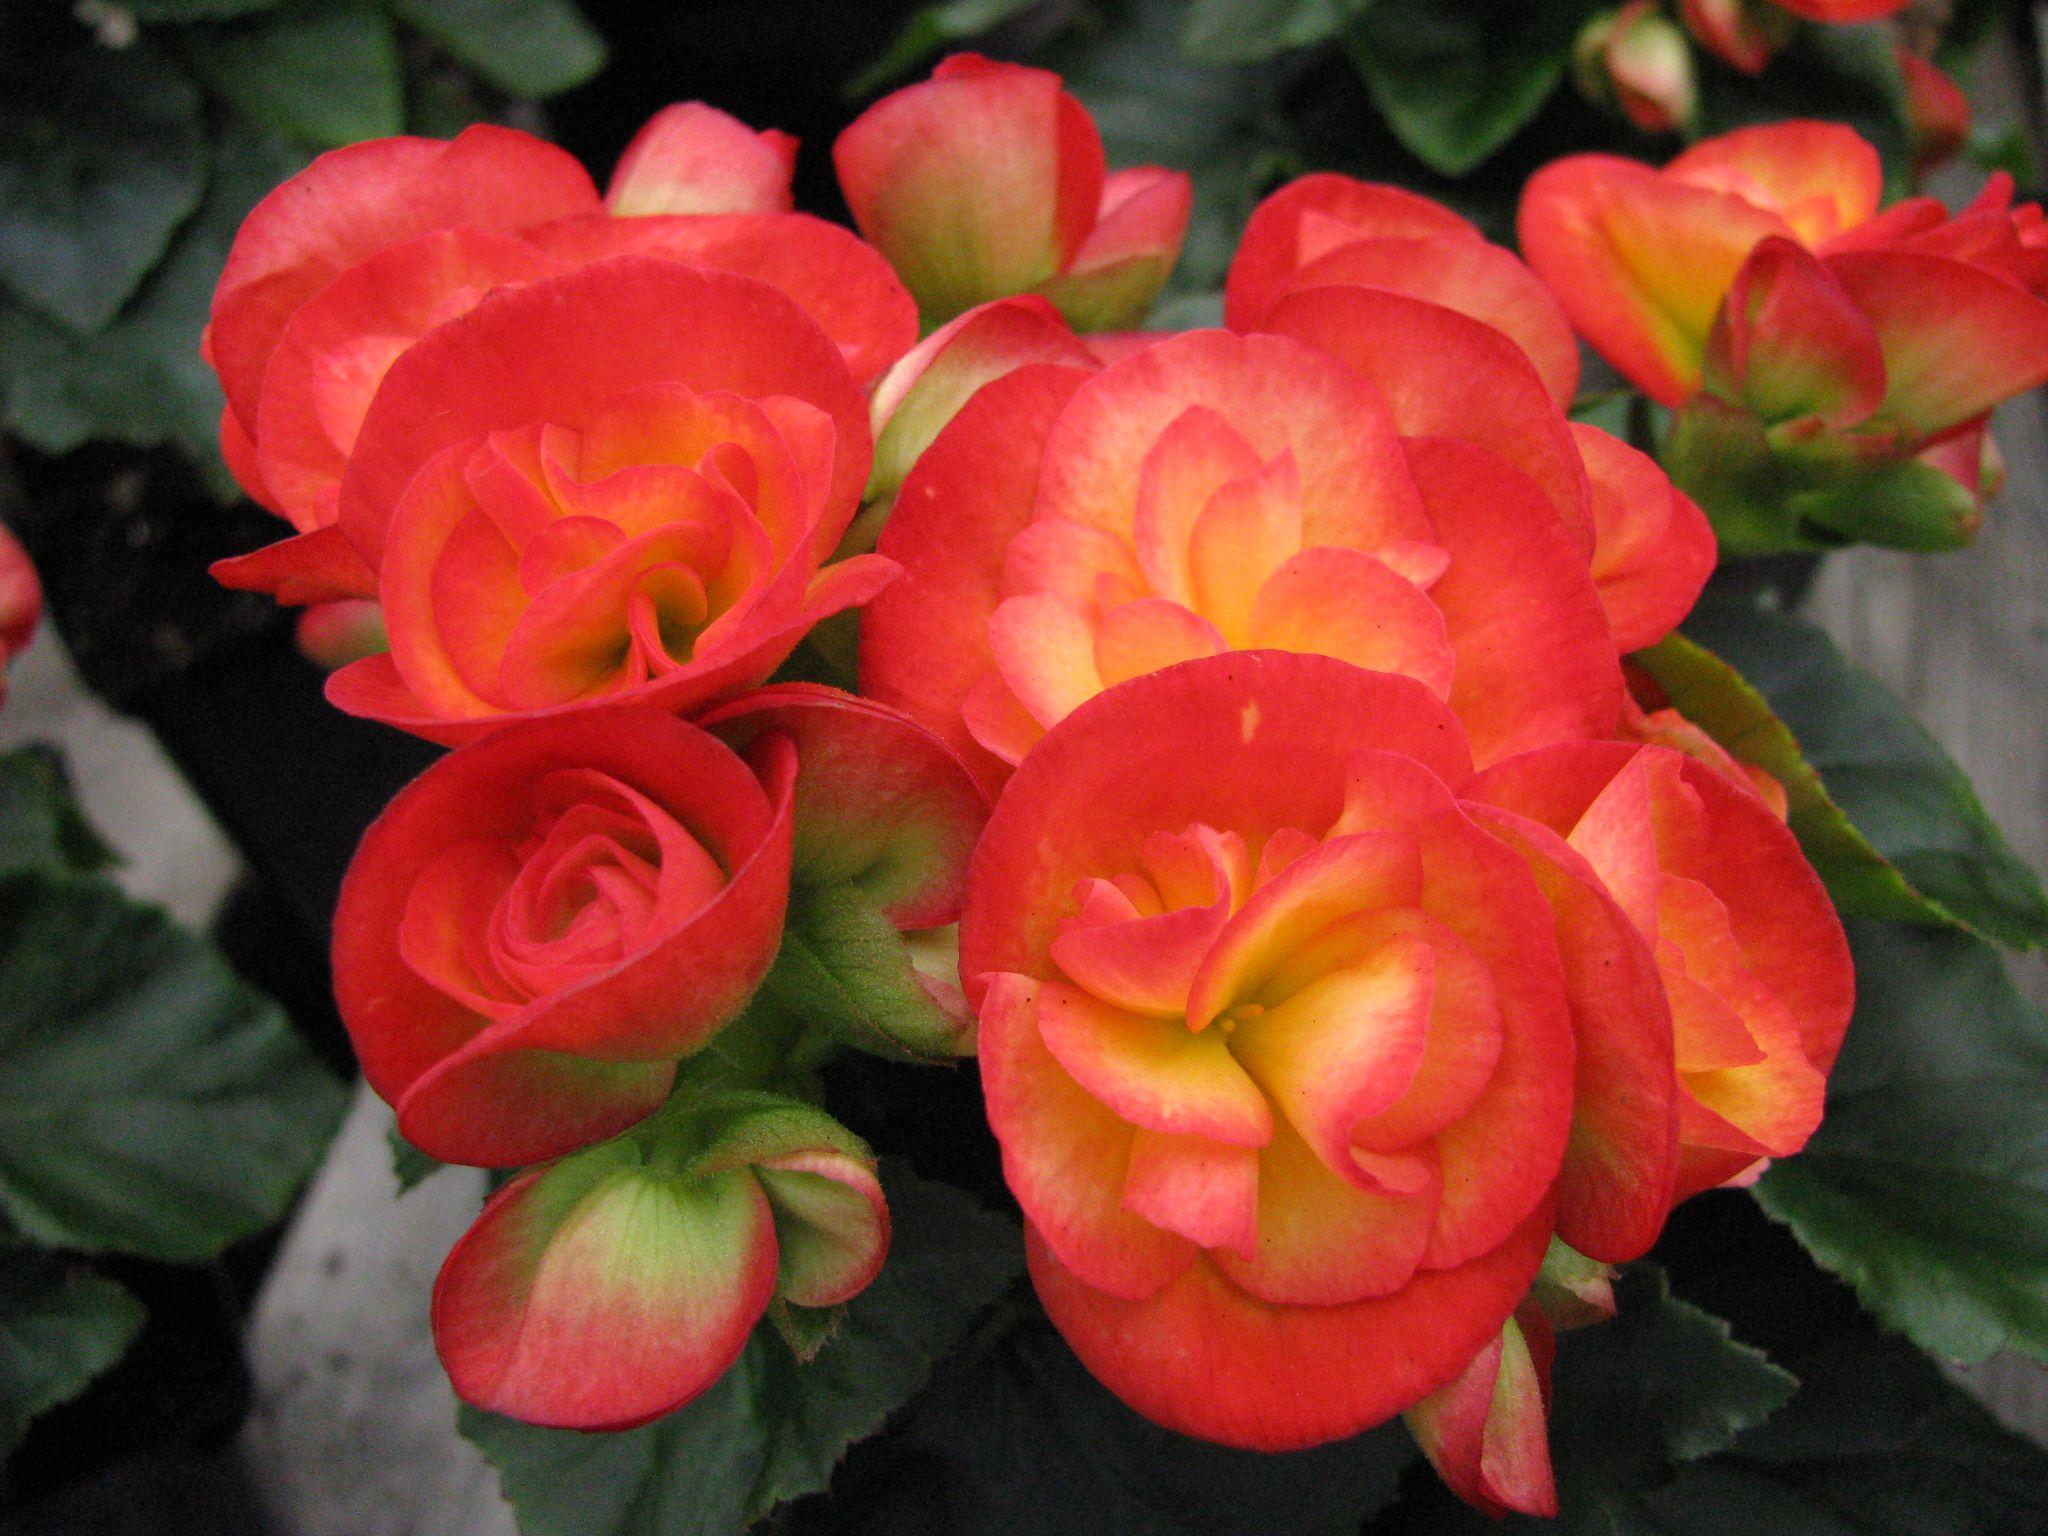 How To Grow Flowering Winter Begonias